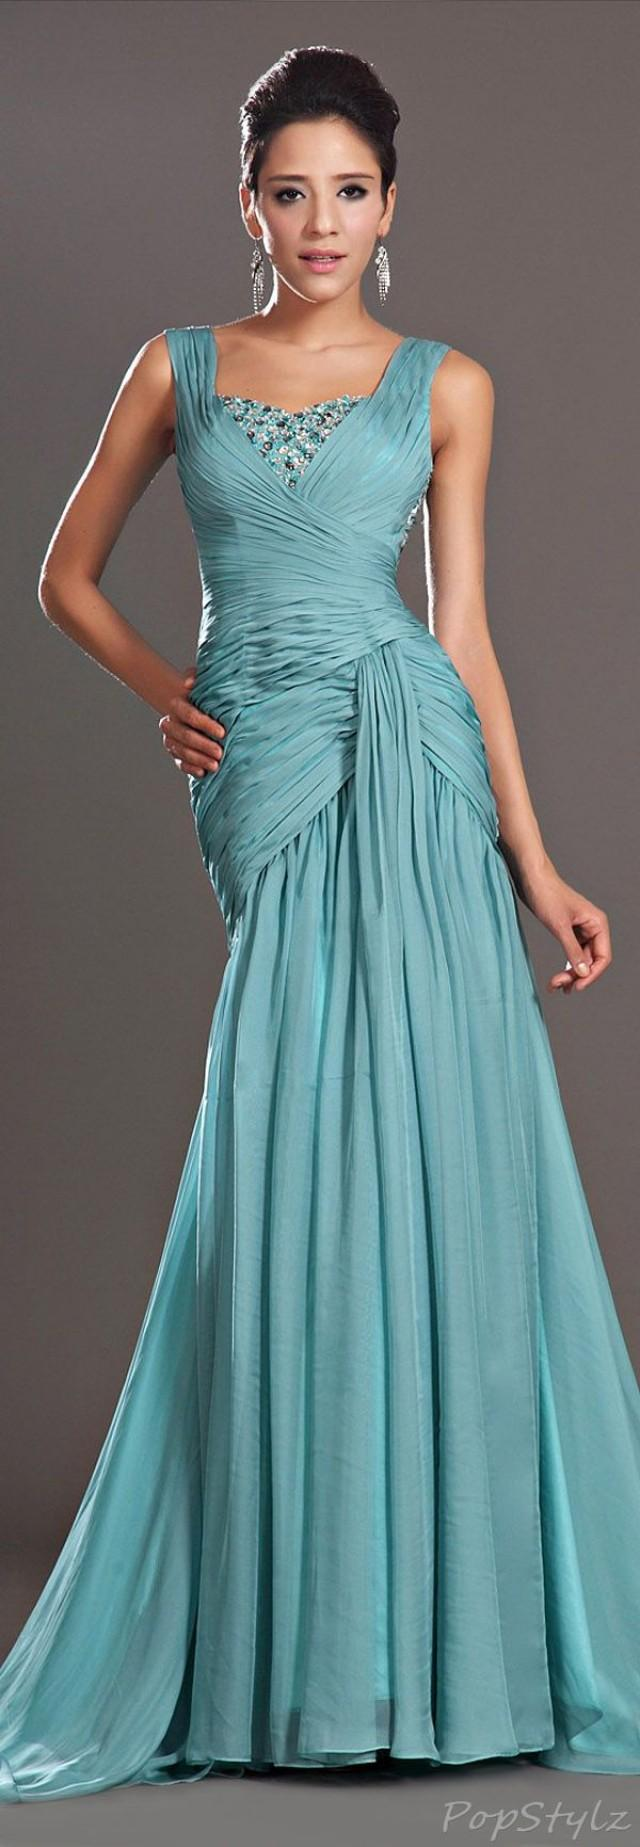 Wedding Theme - Gowns Of Elegance Part 2 #2545476 - Weddbook